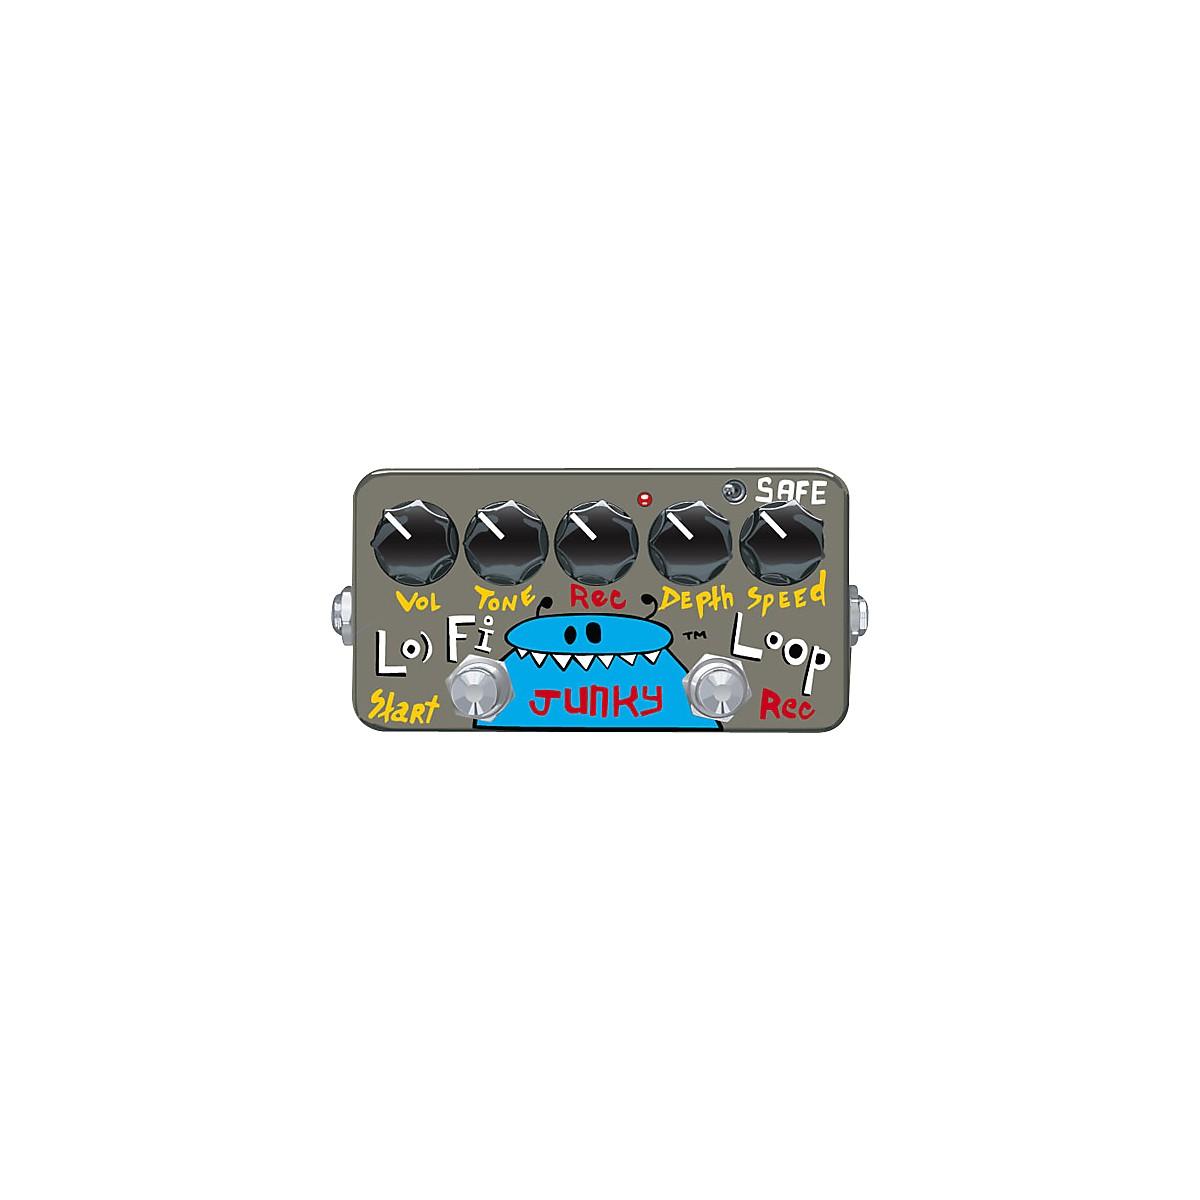 Zvex Hand-Painted LO-FI Loop Junky Guitar Effects Pedal